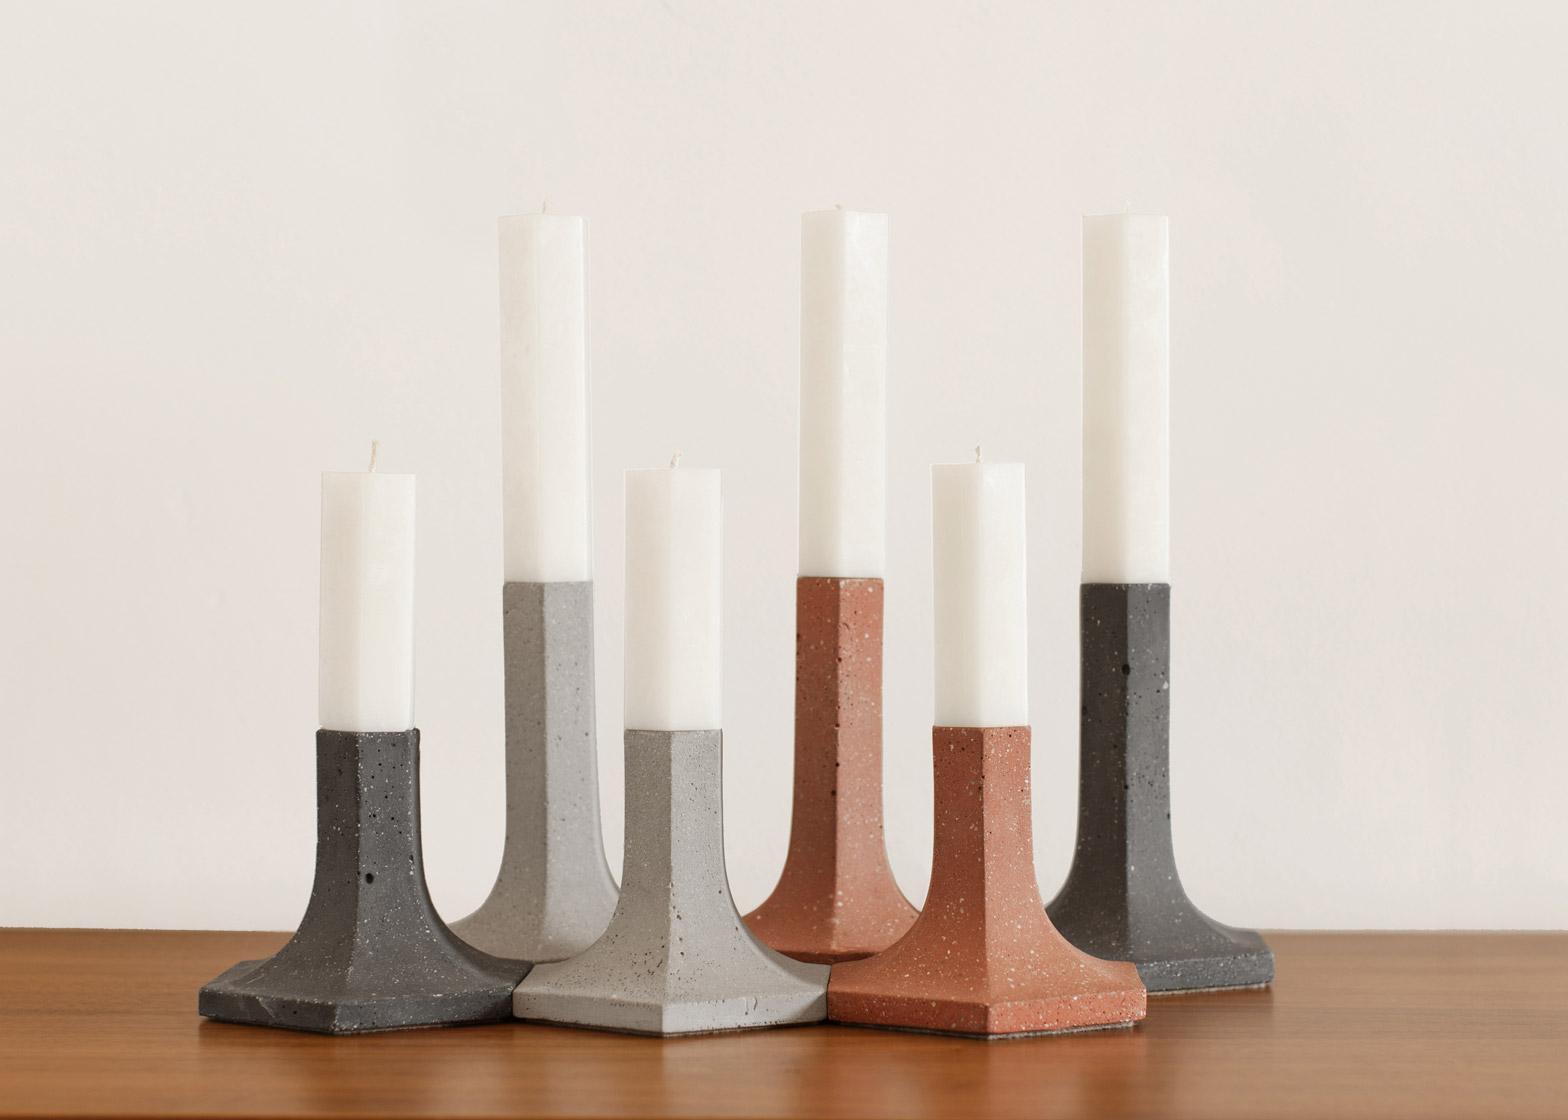 Candela candlesticks by La Selva